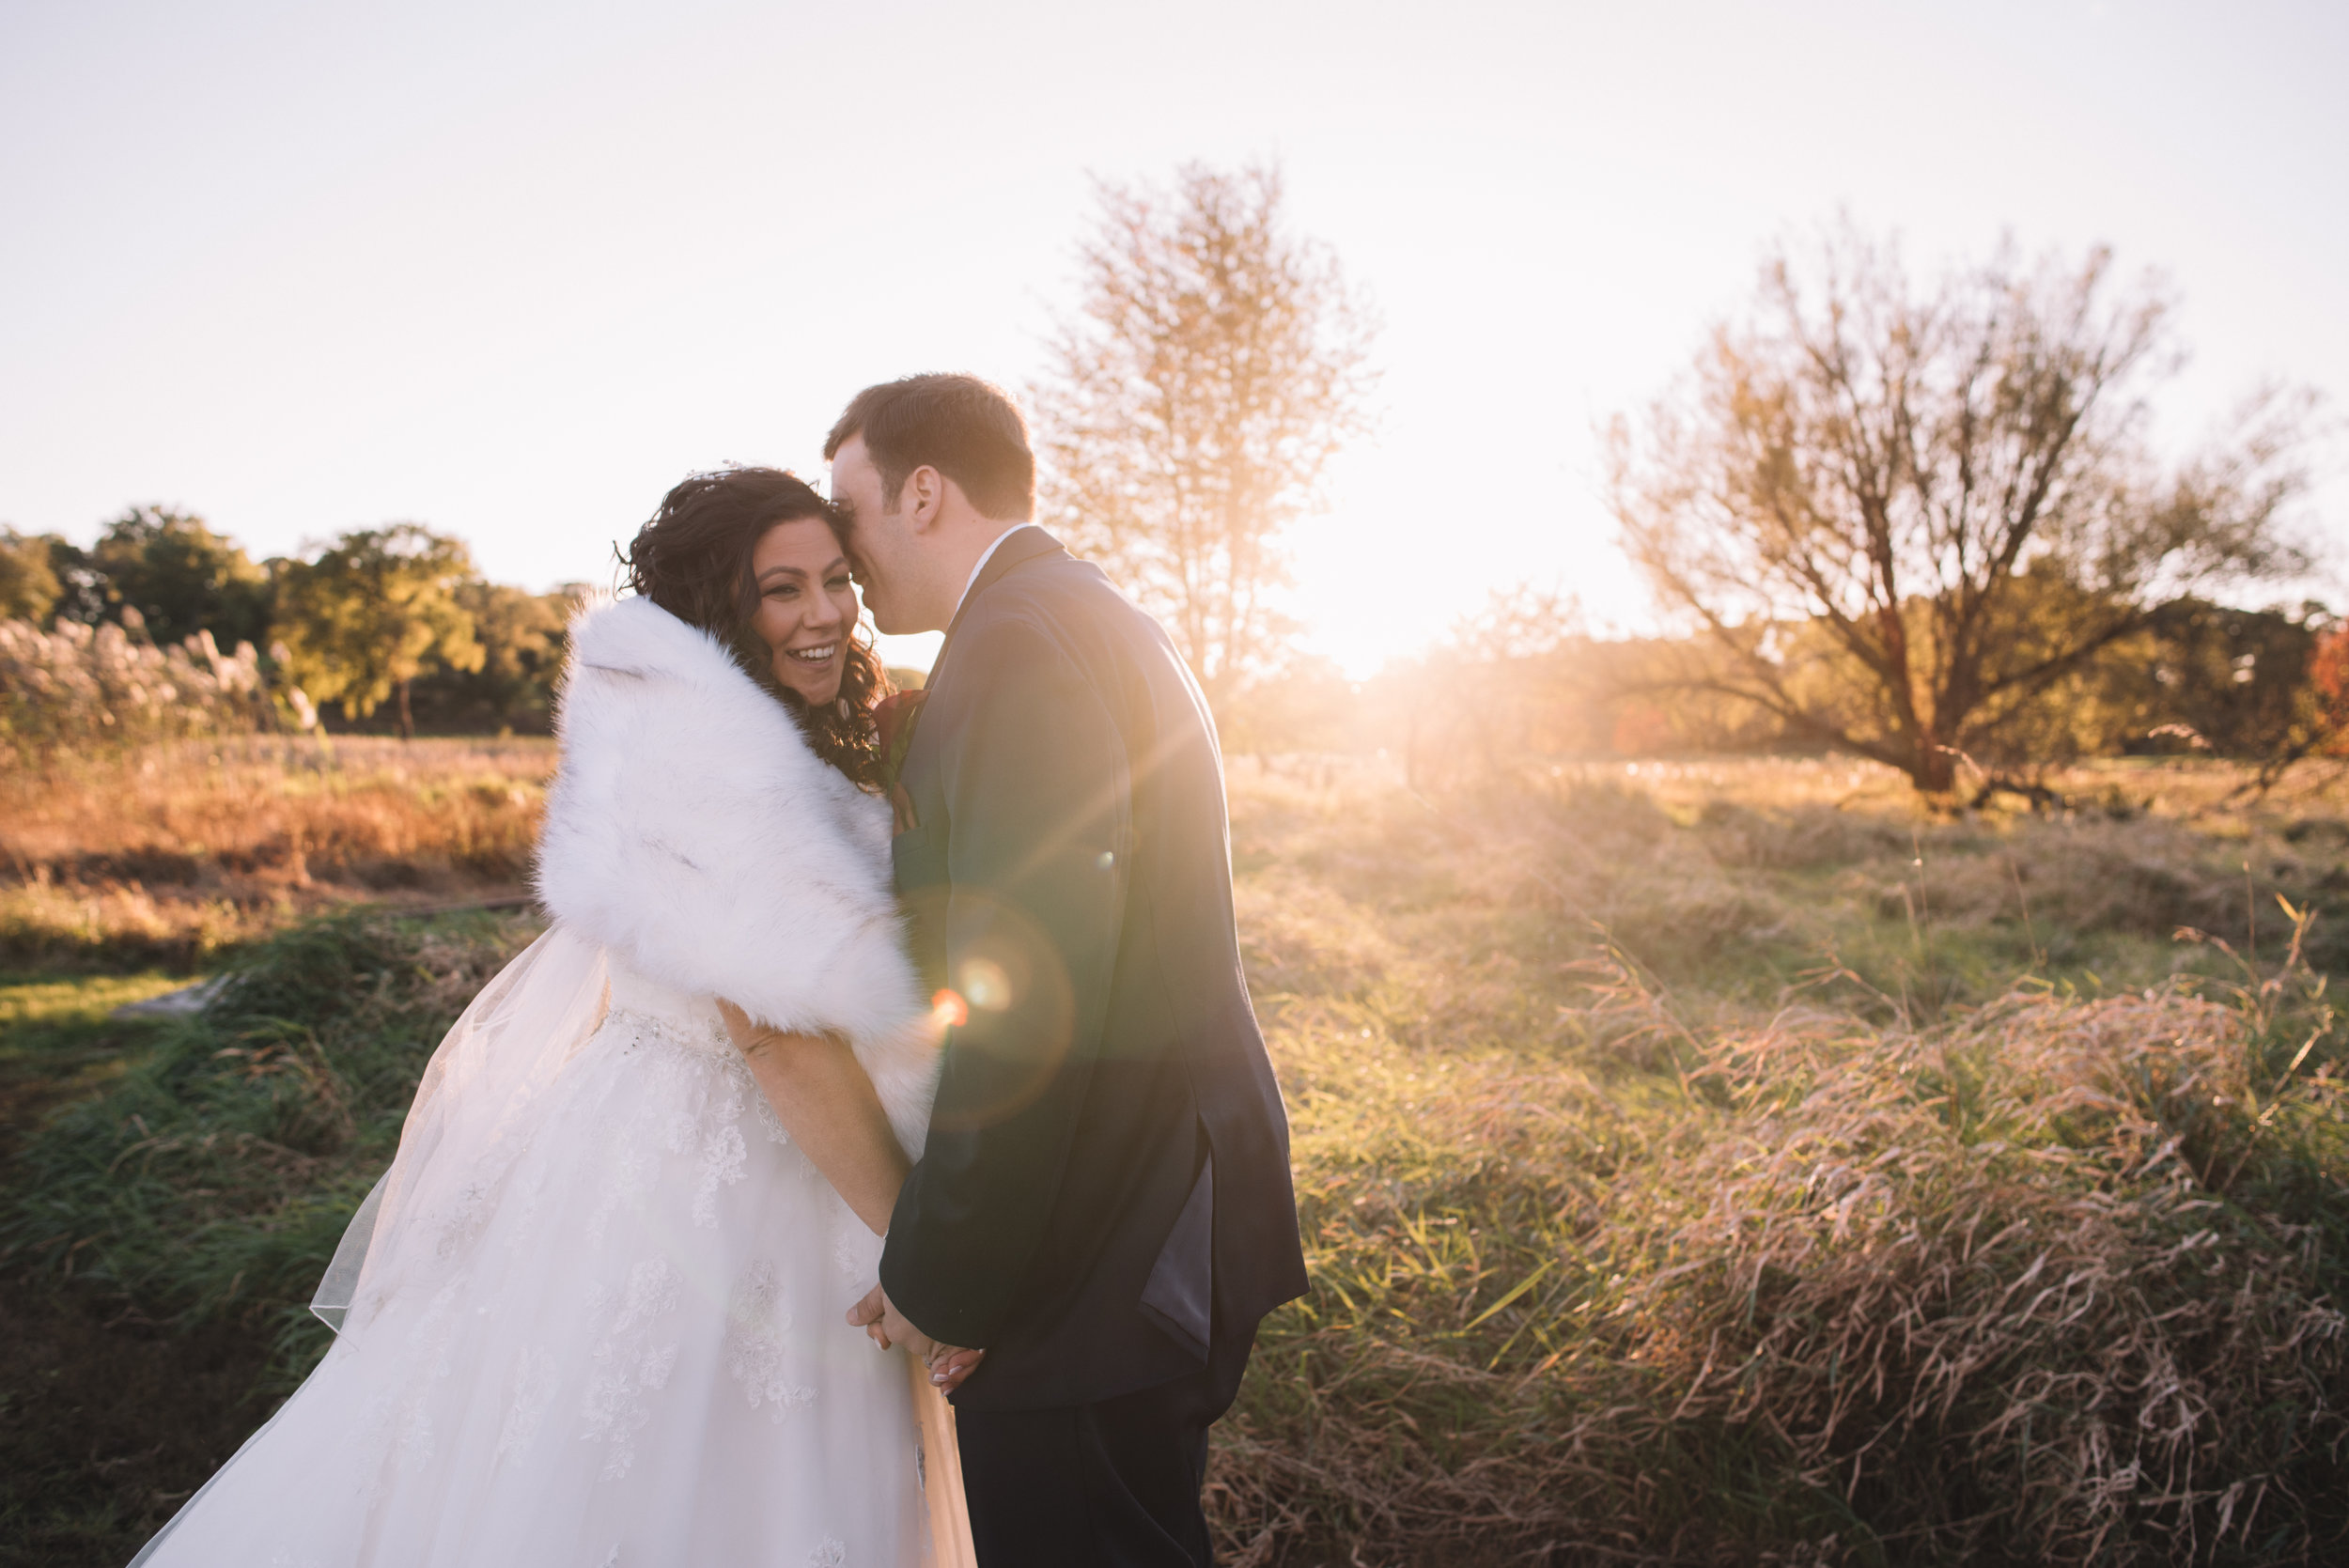 WeddingPhotos | NJPhotographer | Highlights-2-48.jpg